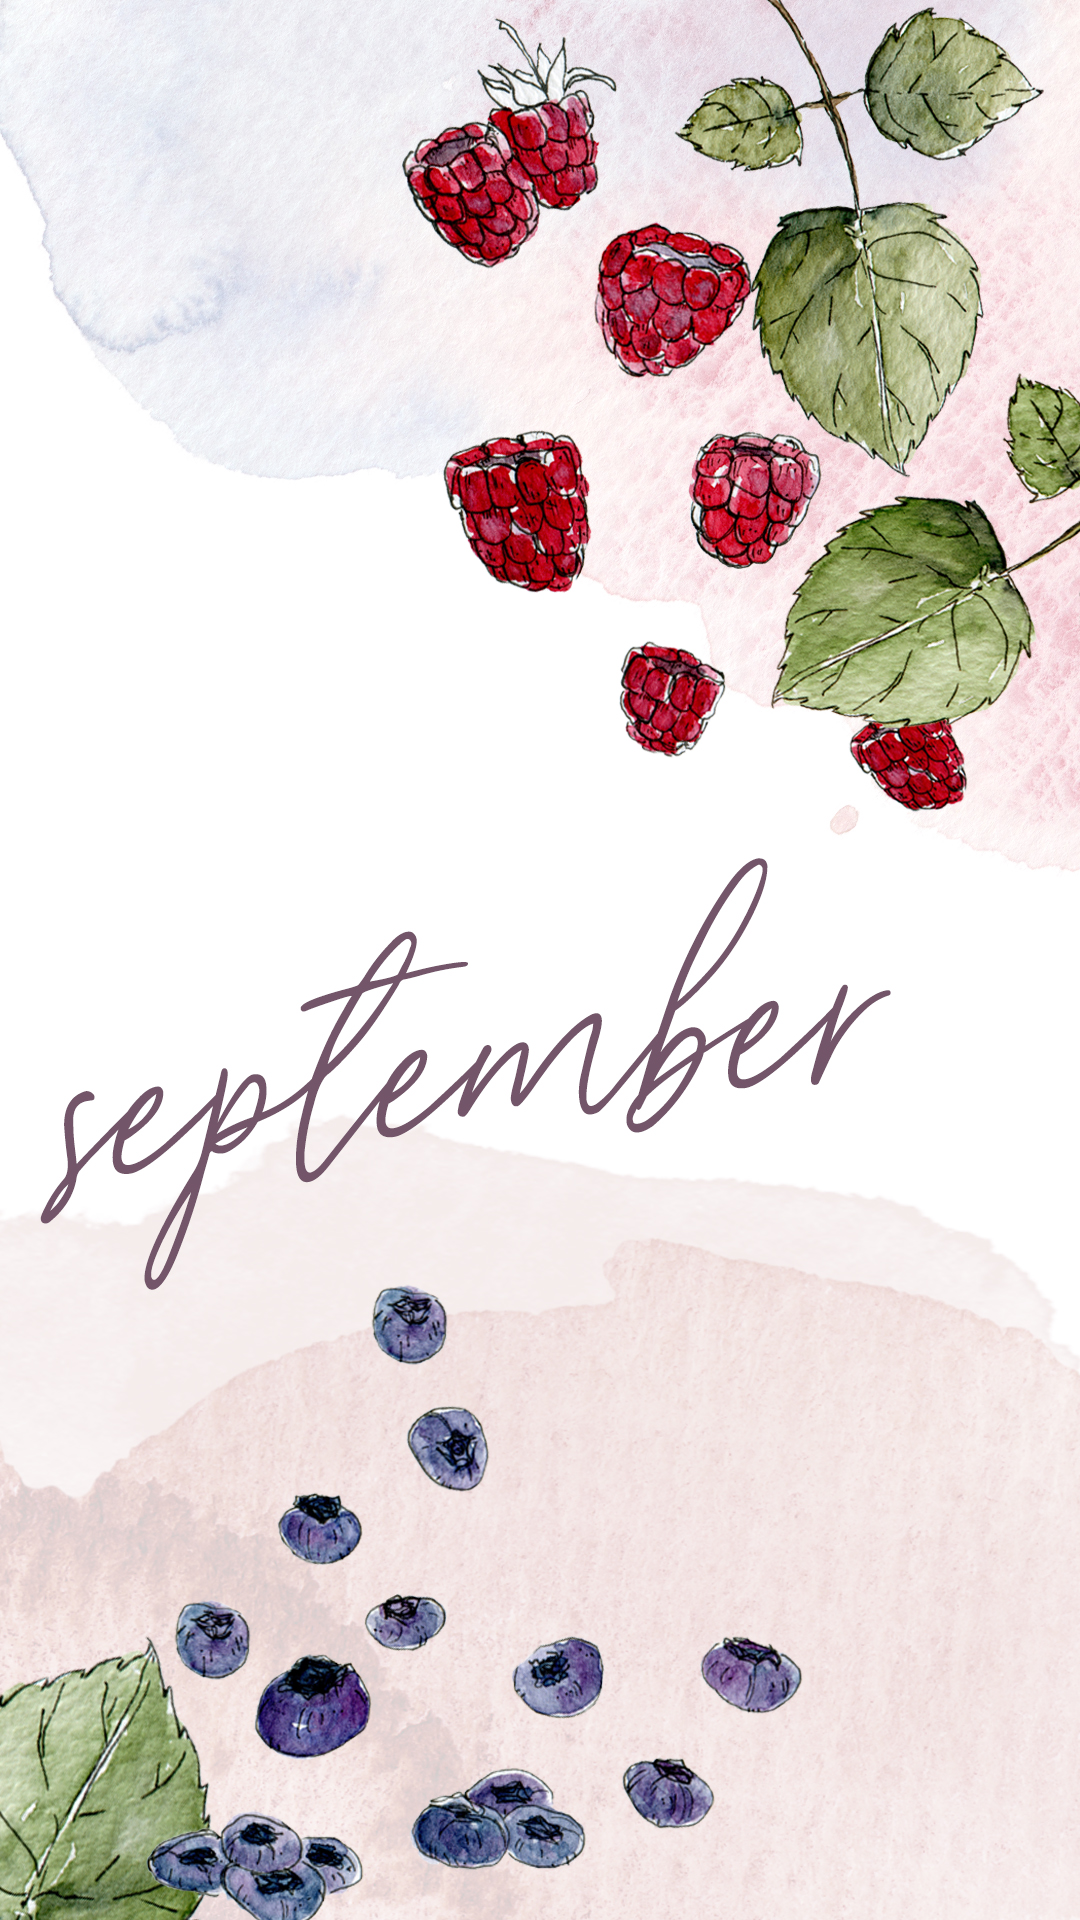 septemberphone_iphone_1080x1920